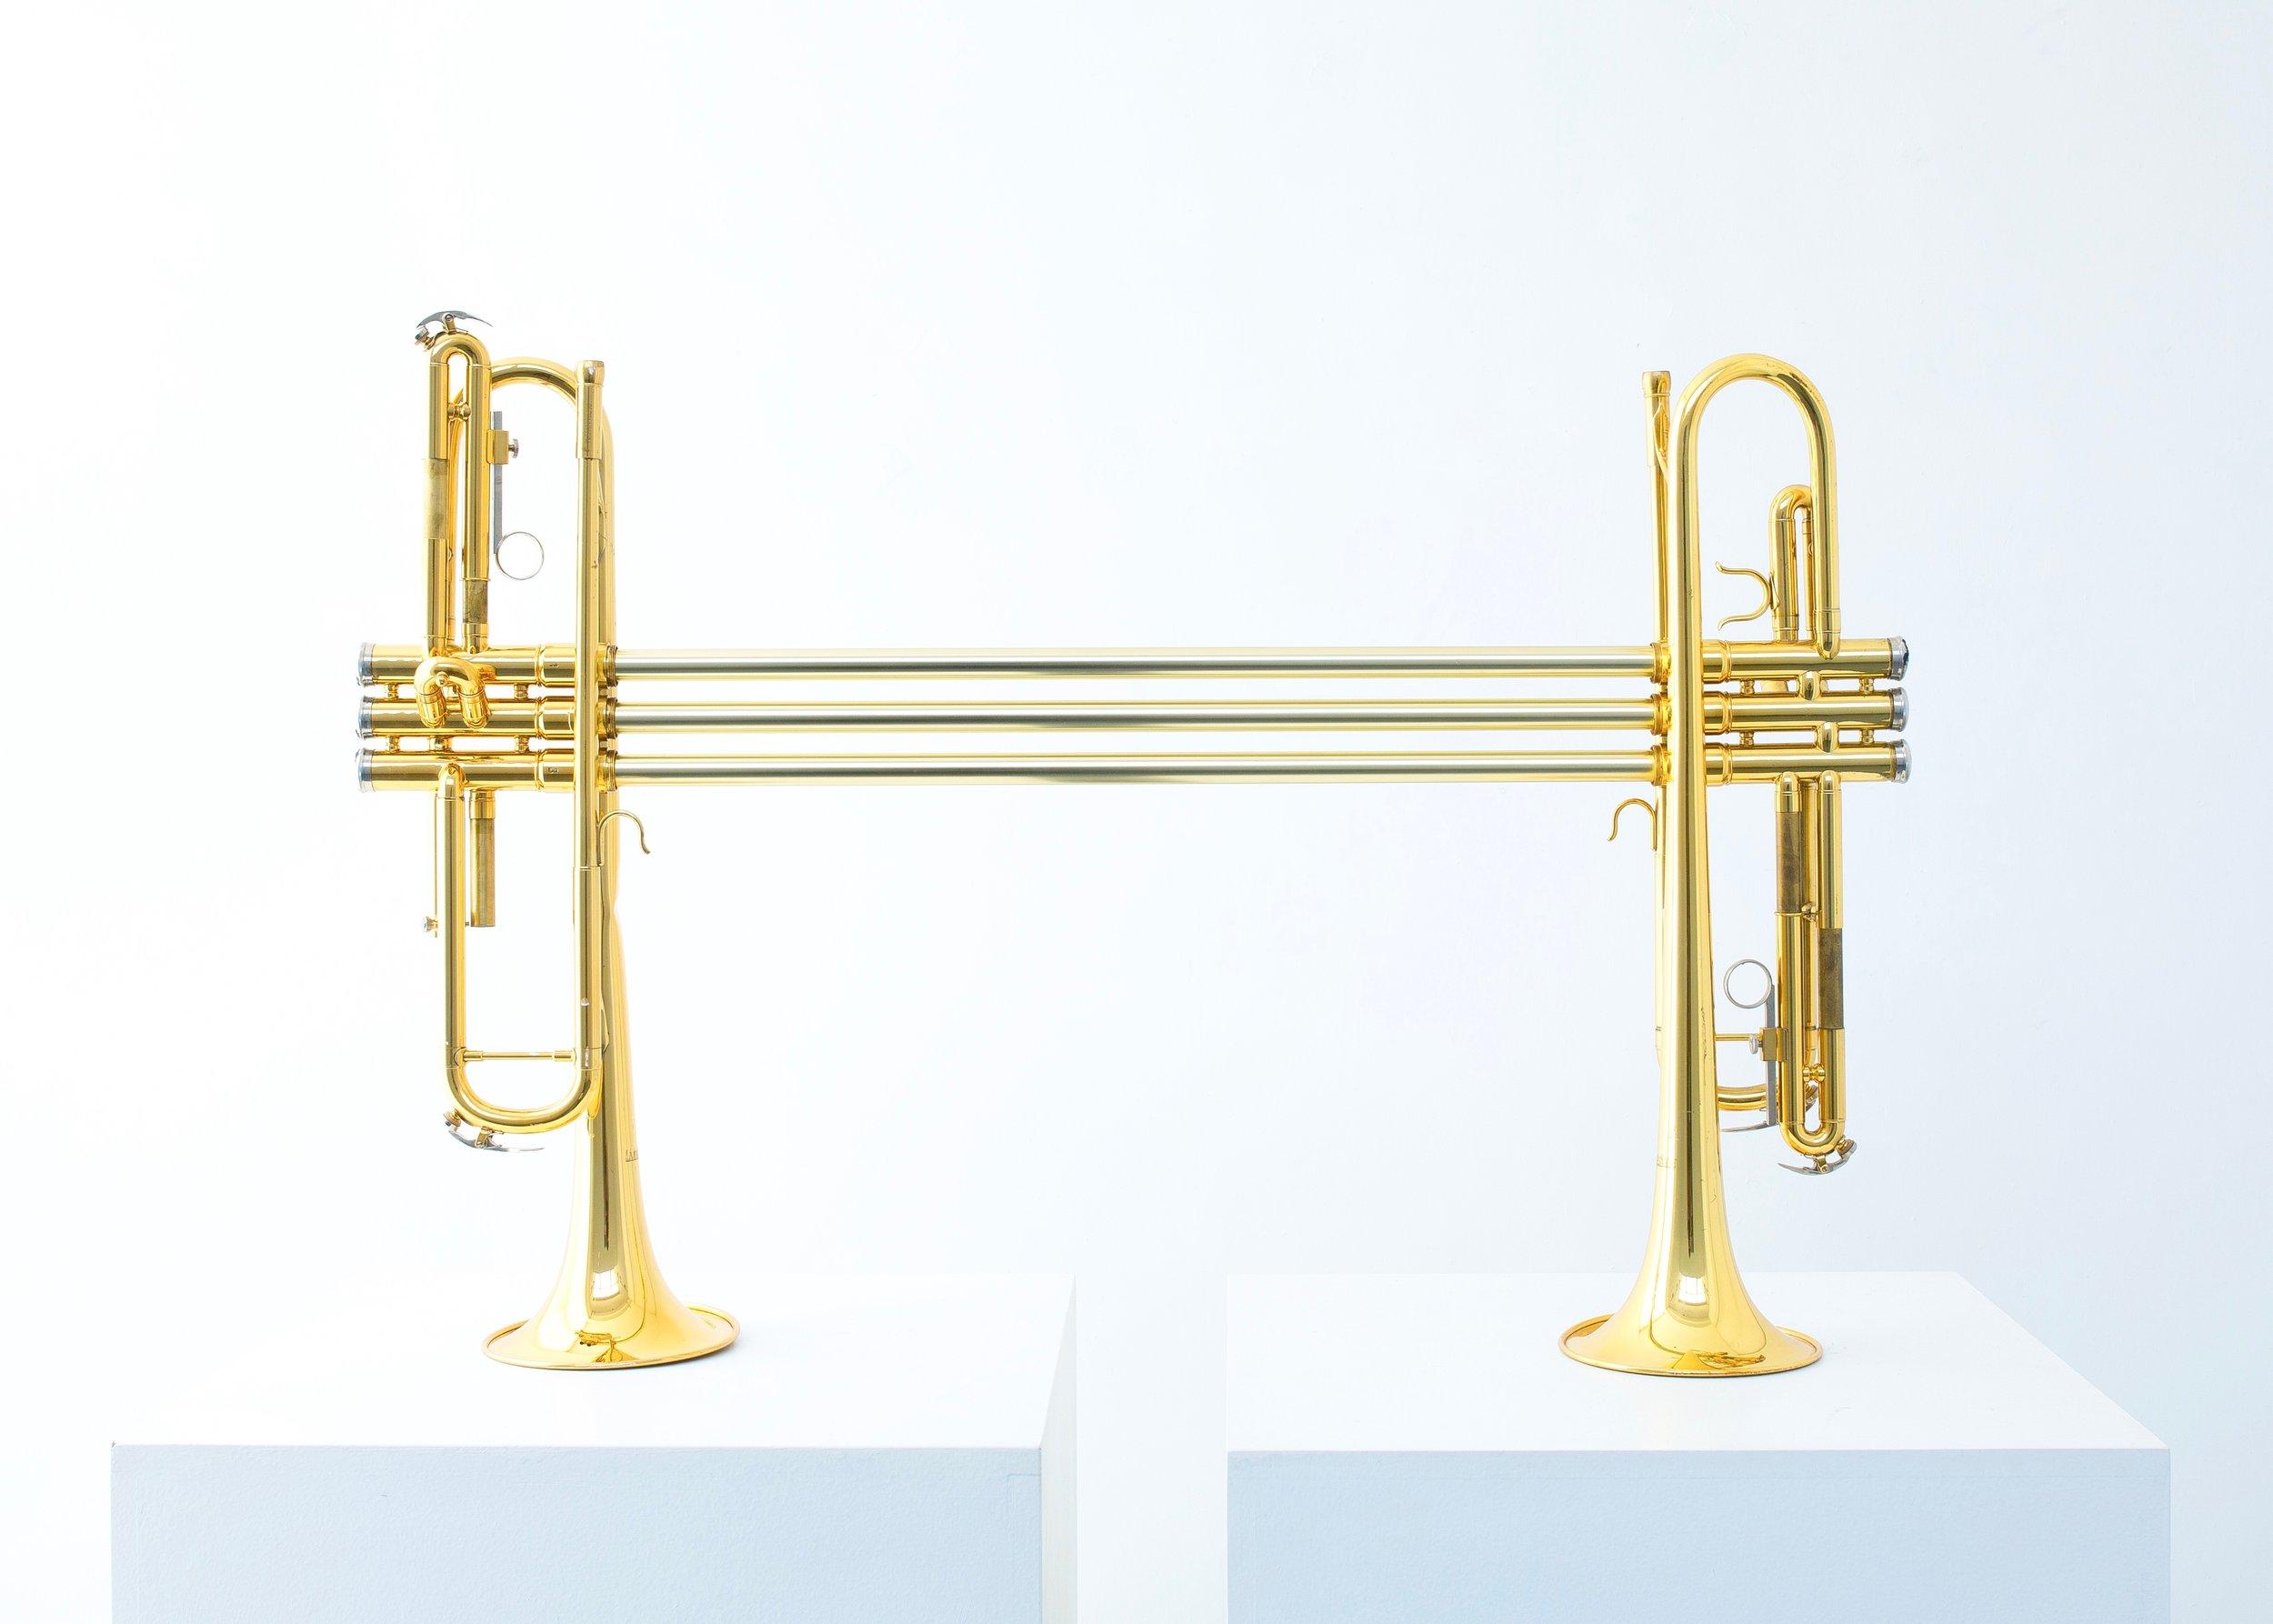 Our Golden Age   Kronenberg Wright Gallery, Sydney